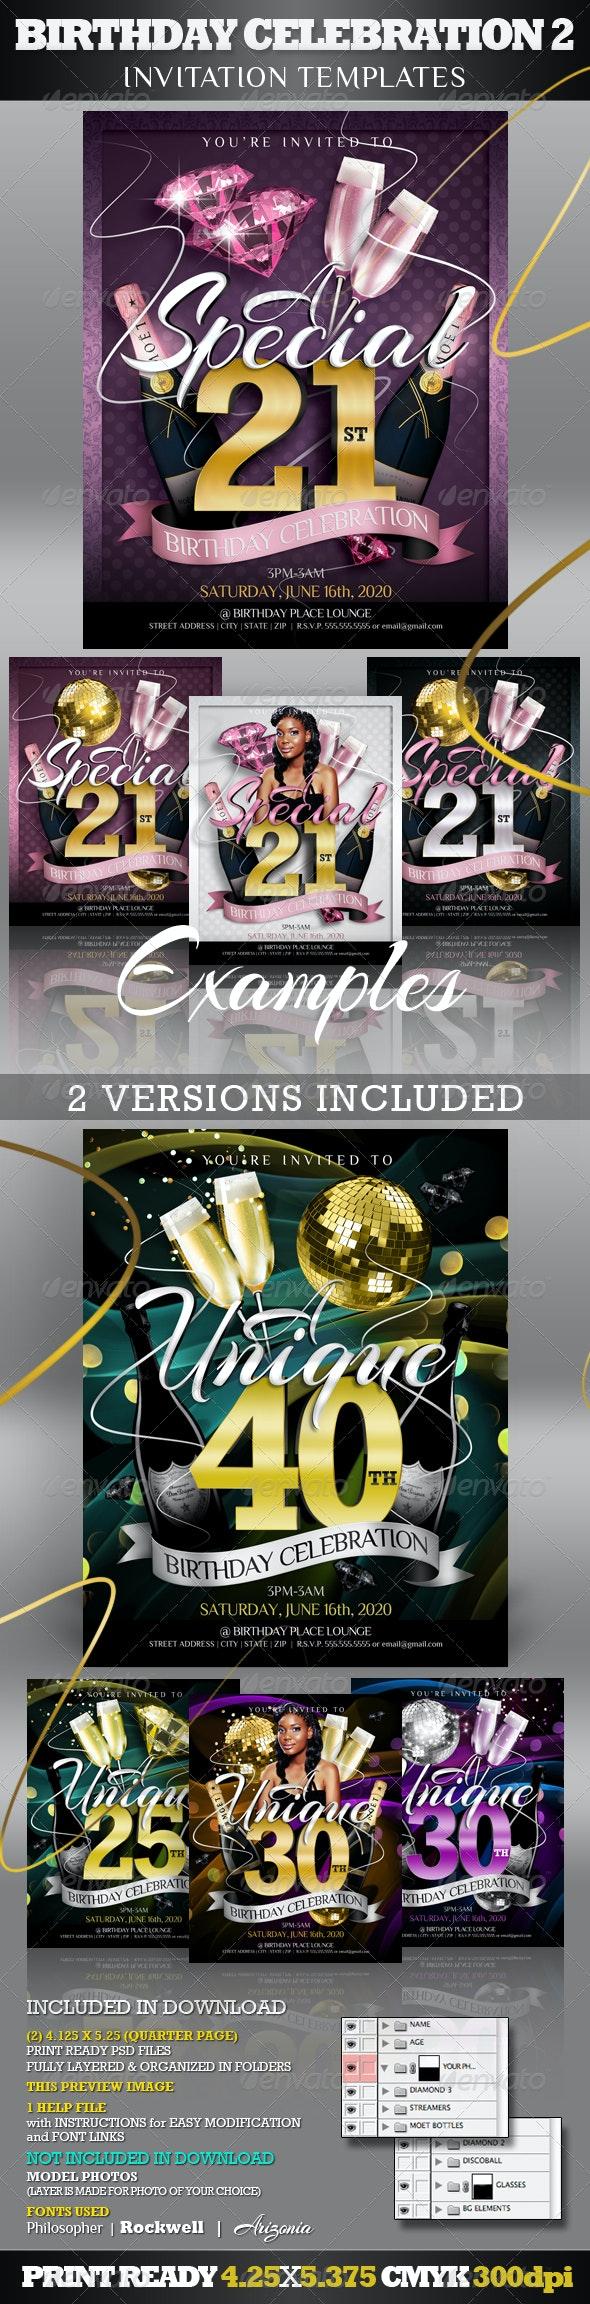 Birthday Invitation Templates 2 - Club Flyer Style - Invitations Cards & Invites